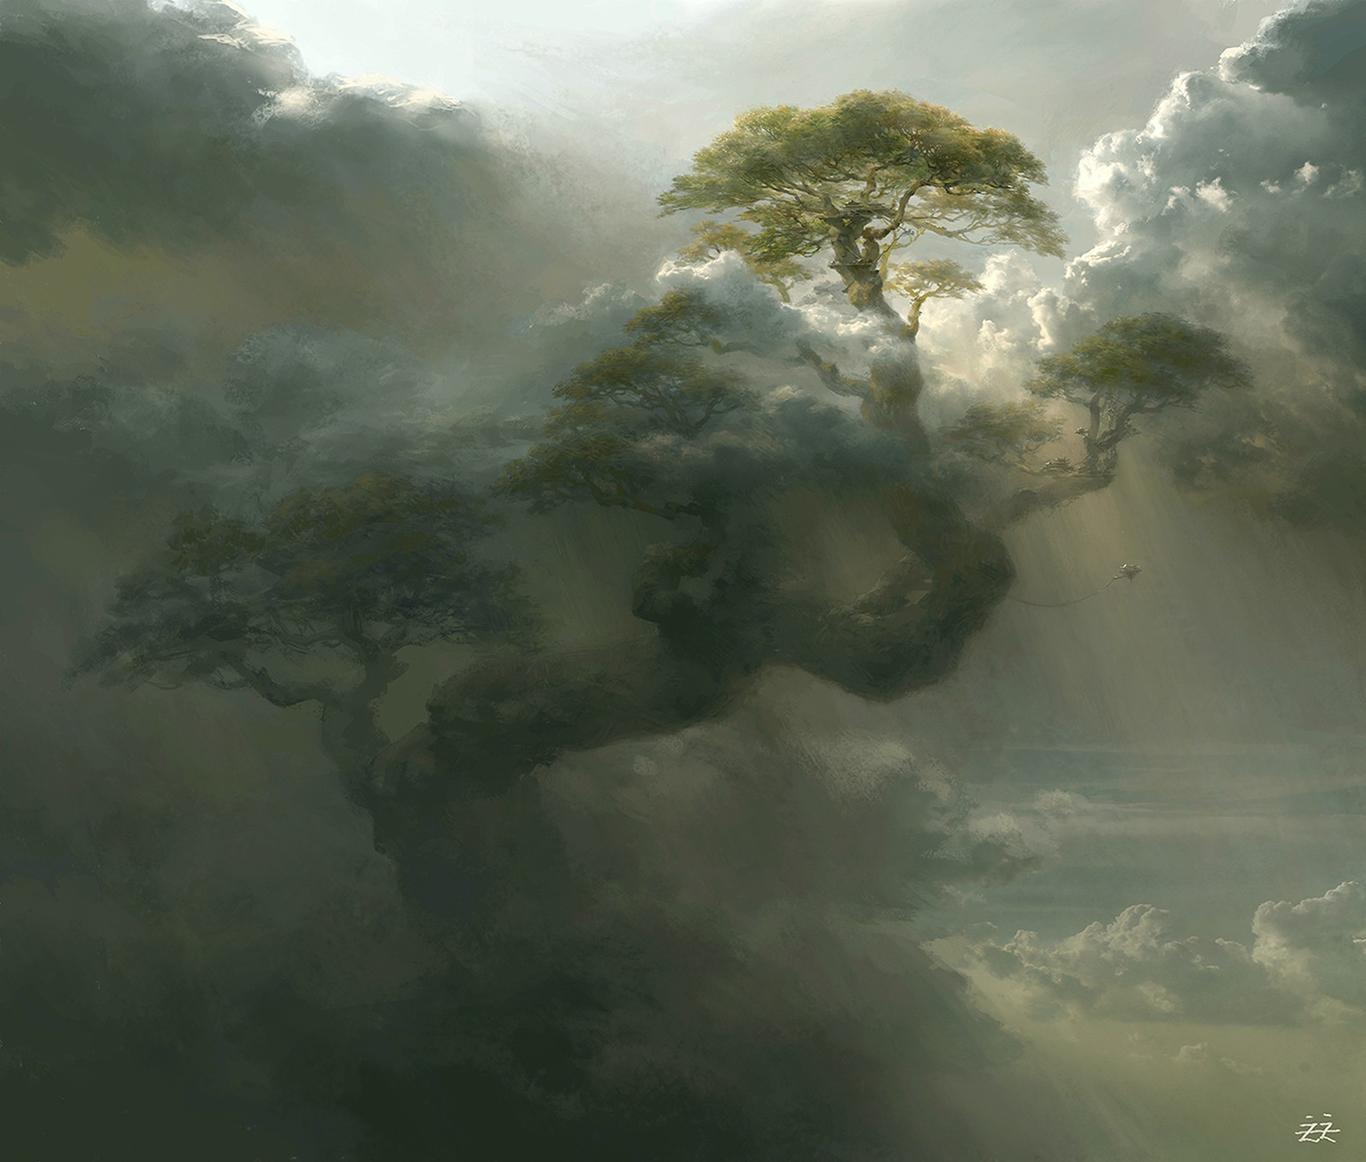 Tianhua x giant tree 1 30c0db3d vr5l